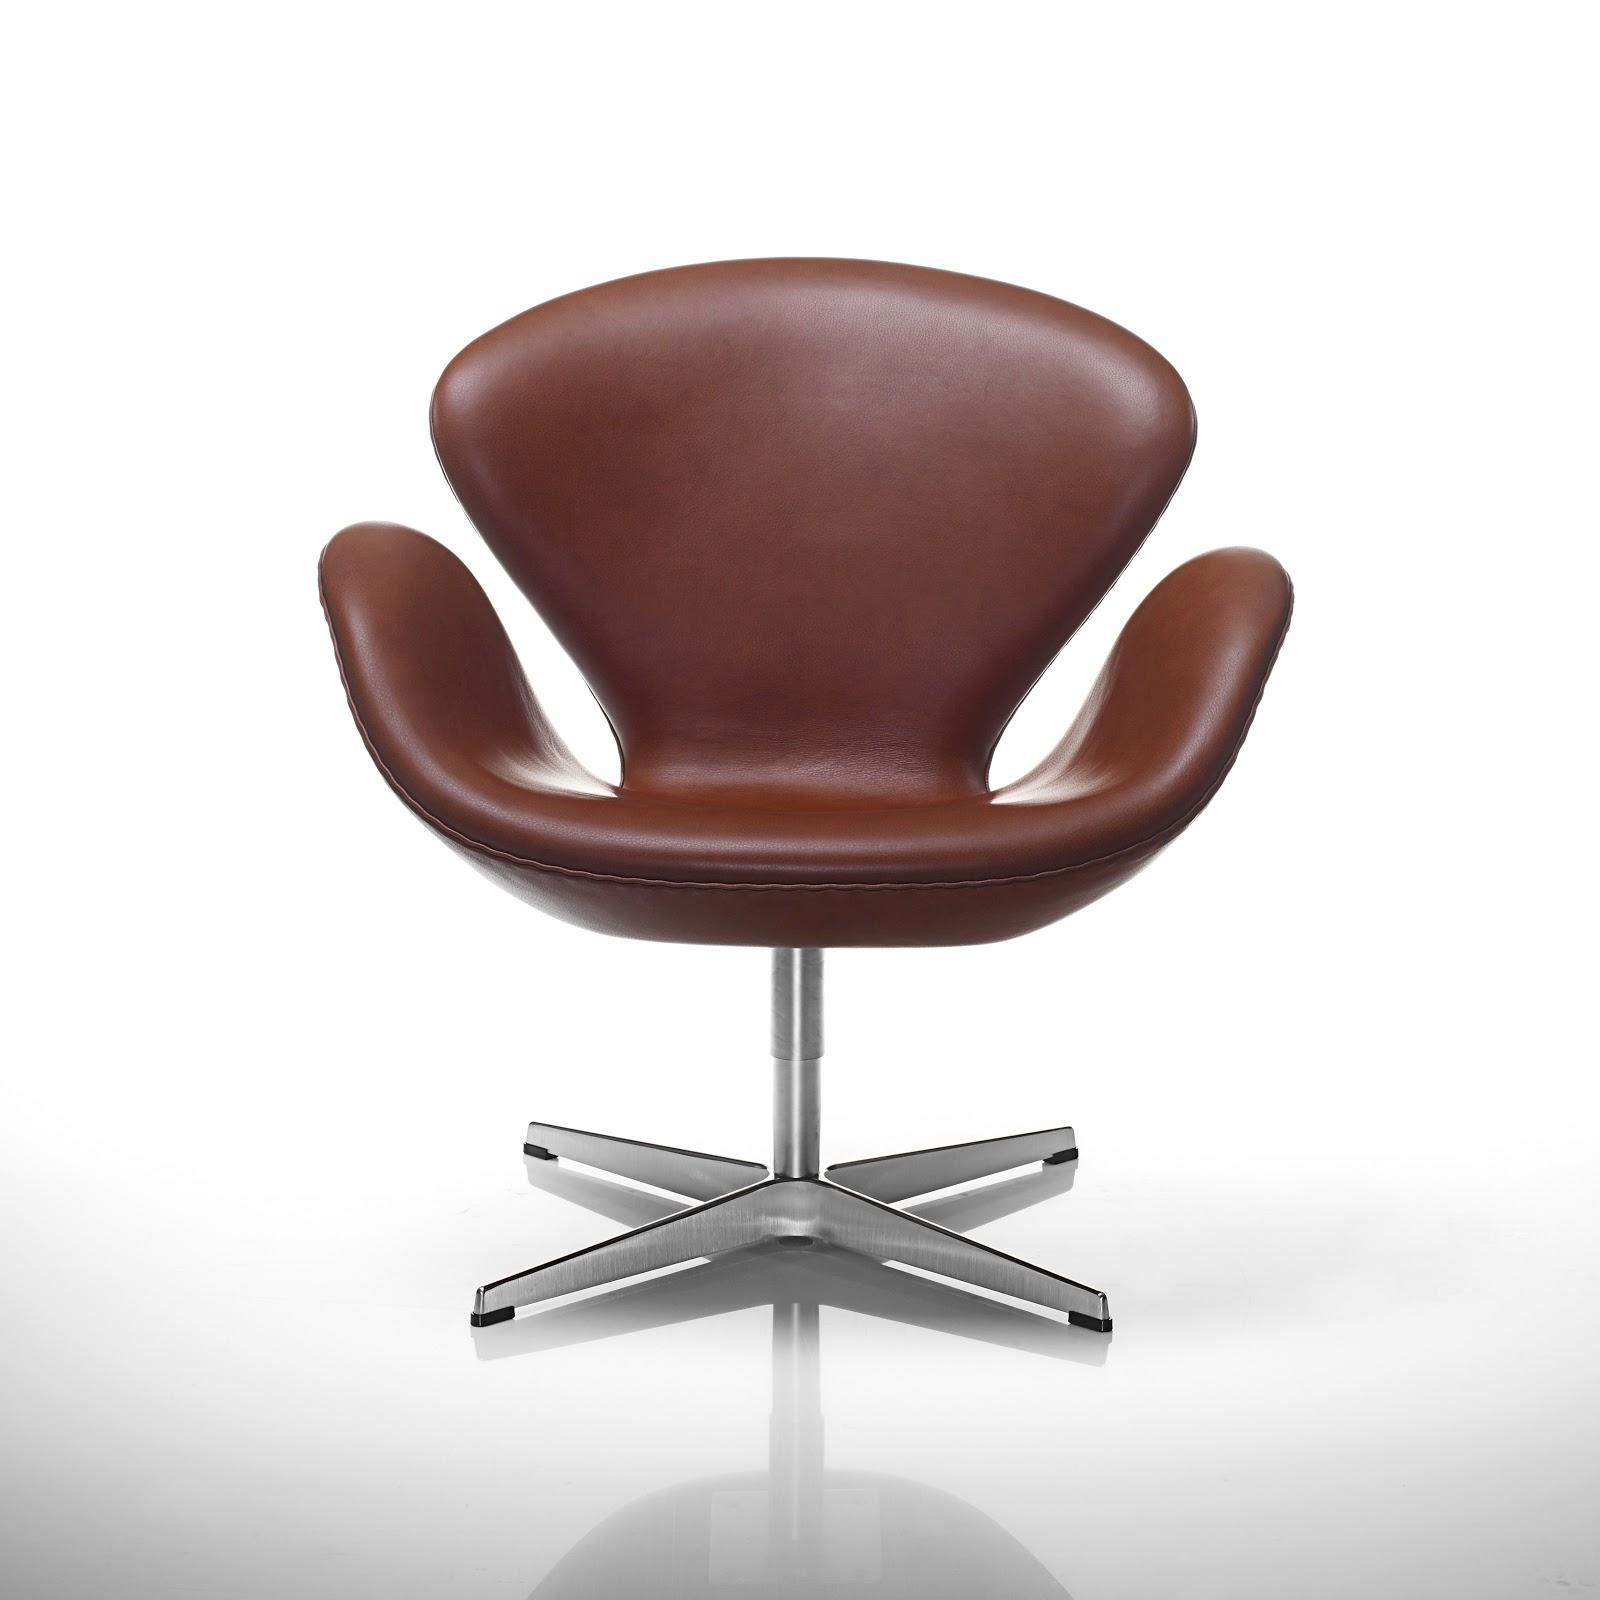 classic leather swan elegant chestnut brown arne jacobsen lounge chair. Black Bedroom Furniture Sets. Home Design Ideas